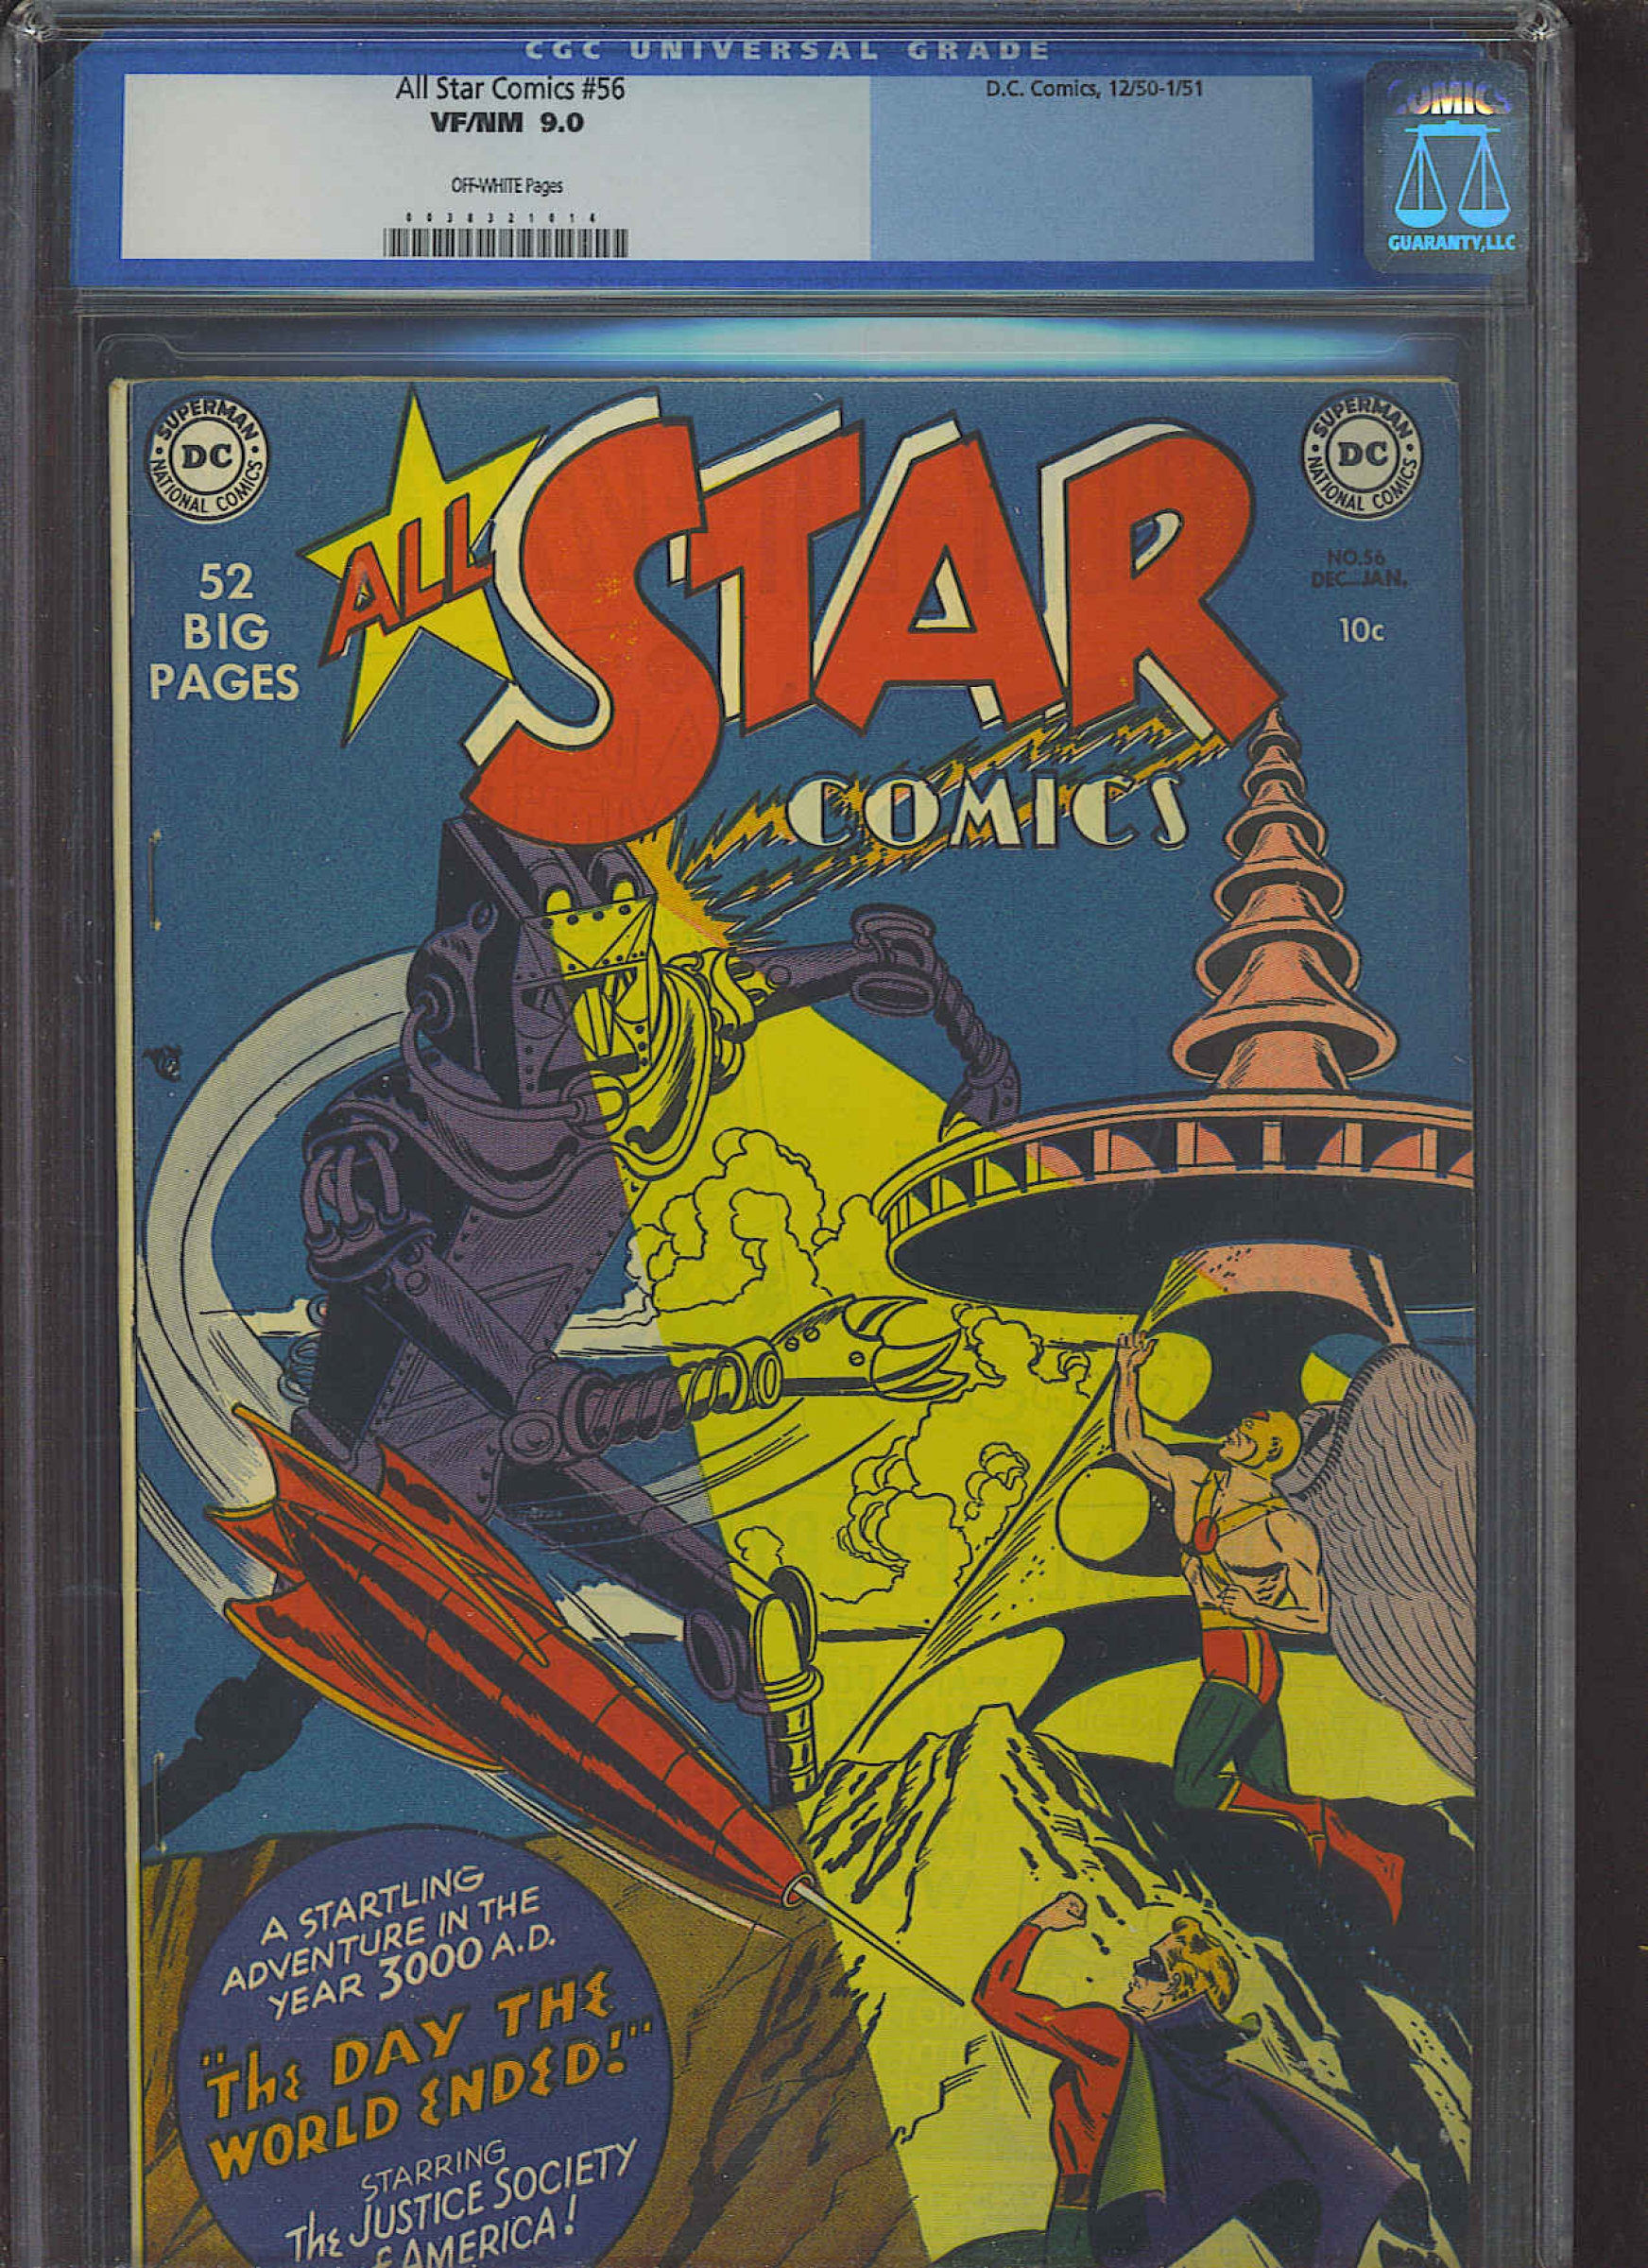 All Star Comics #56 CGC 9.0 ow